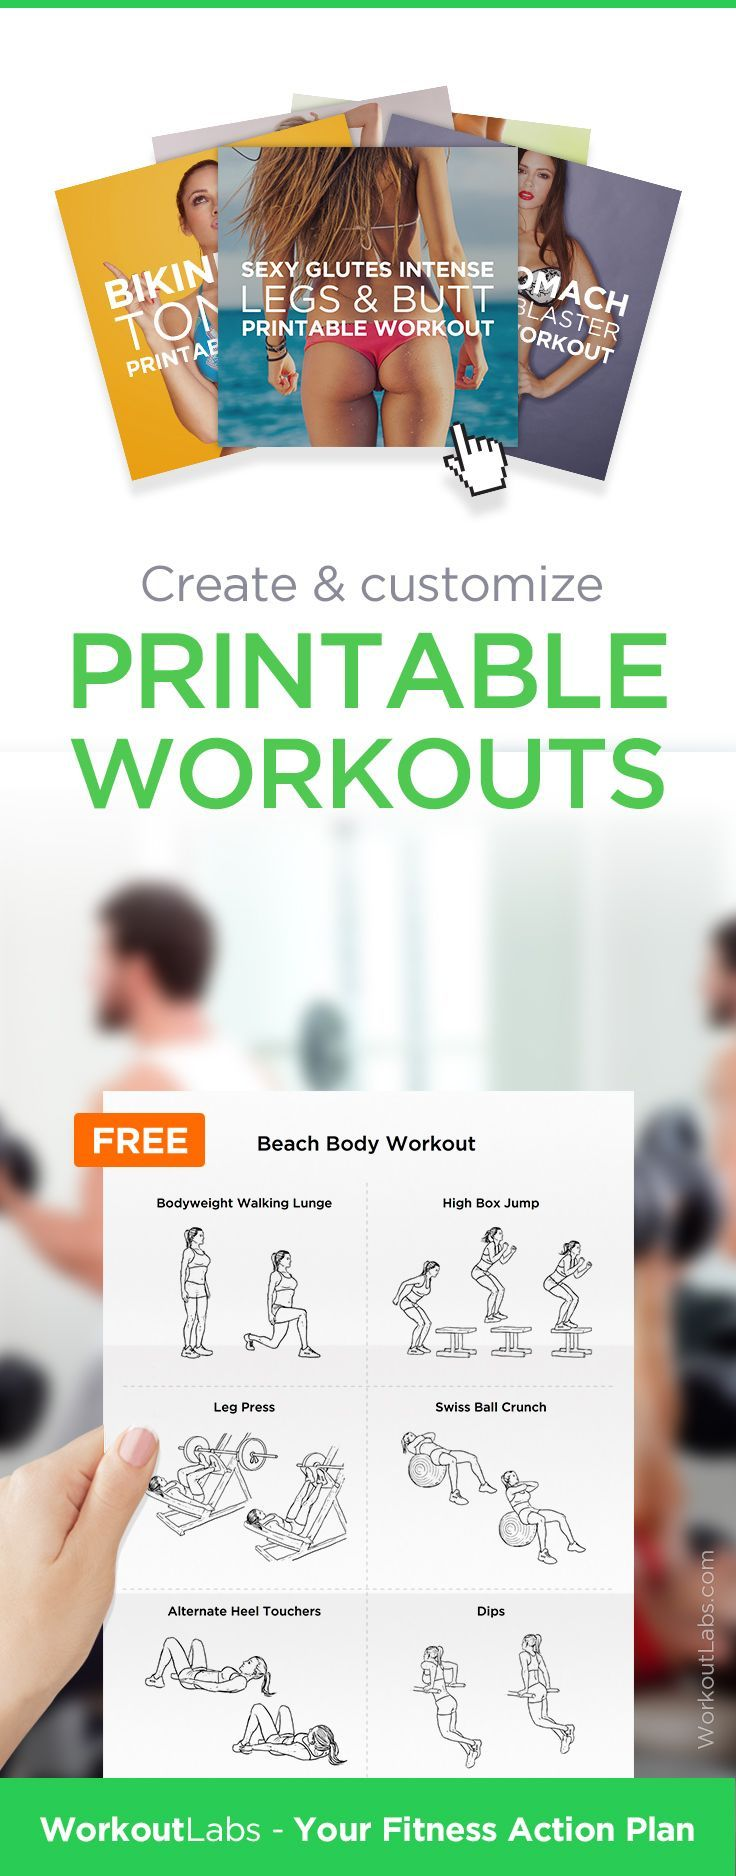 Kayla Itsines Bikini Body Guide: Free Arms Circuit Workout for Women